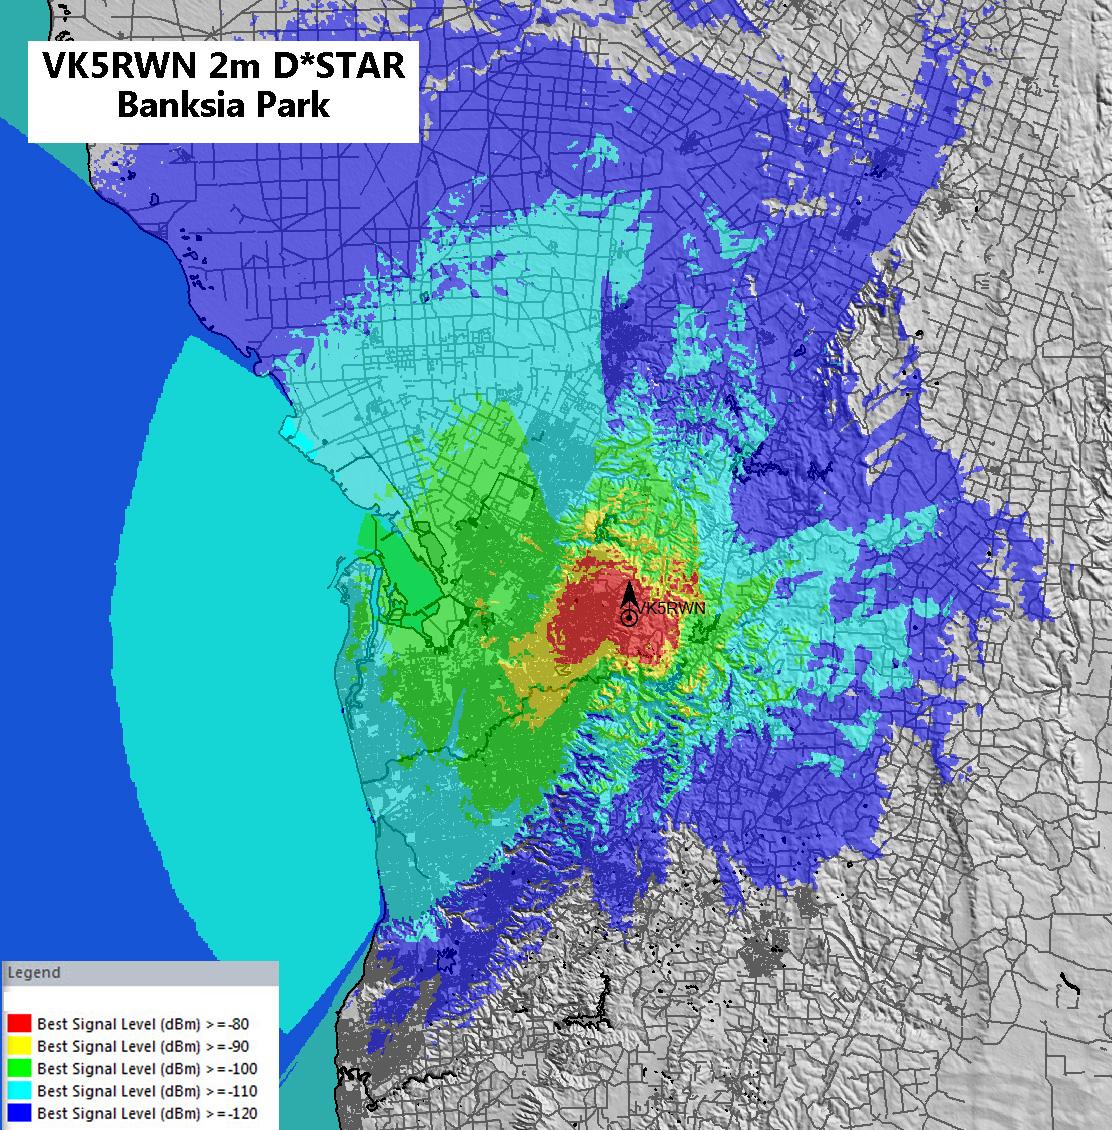 Digital VHF/UHF Repeaters – VK5RWN D*STAR | AREG